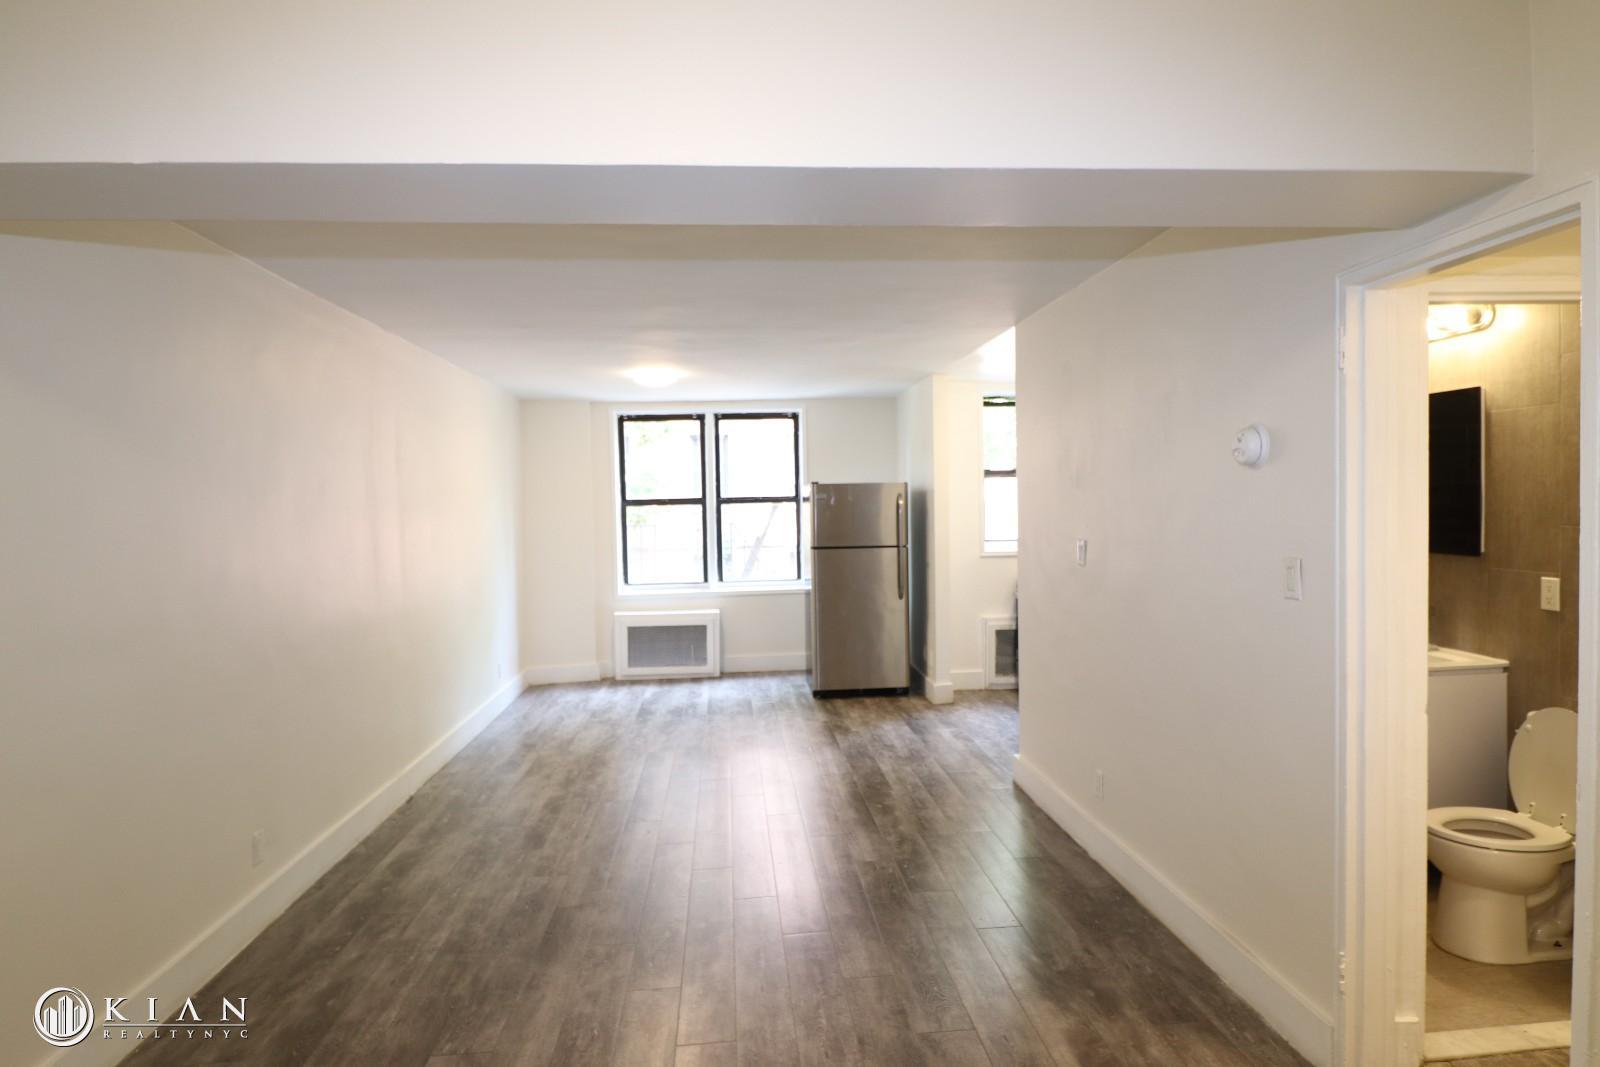 132-45 Maple Avenue, Apt 209/45, Queens, New York 11355